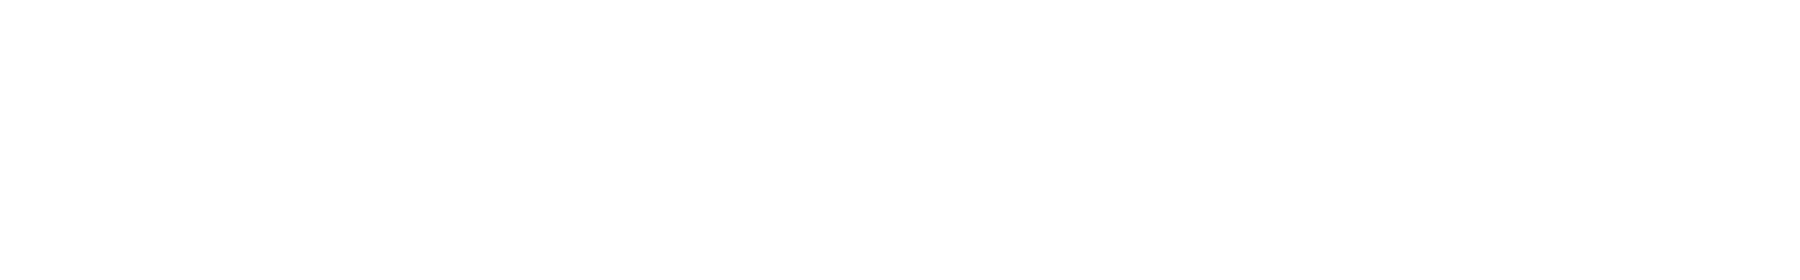 dts chordlp 51c cm wet